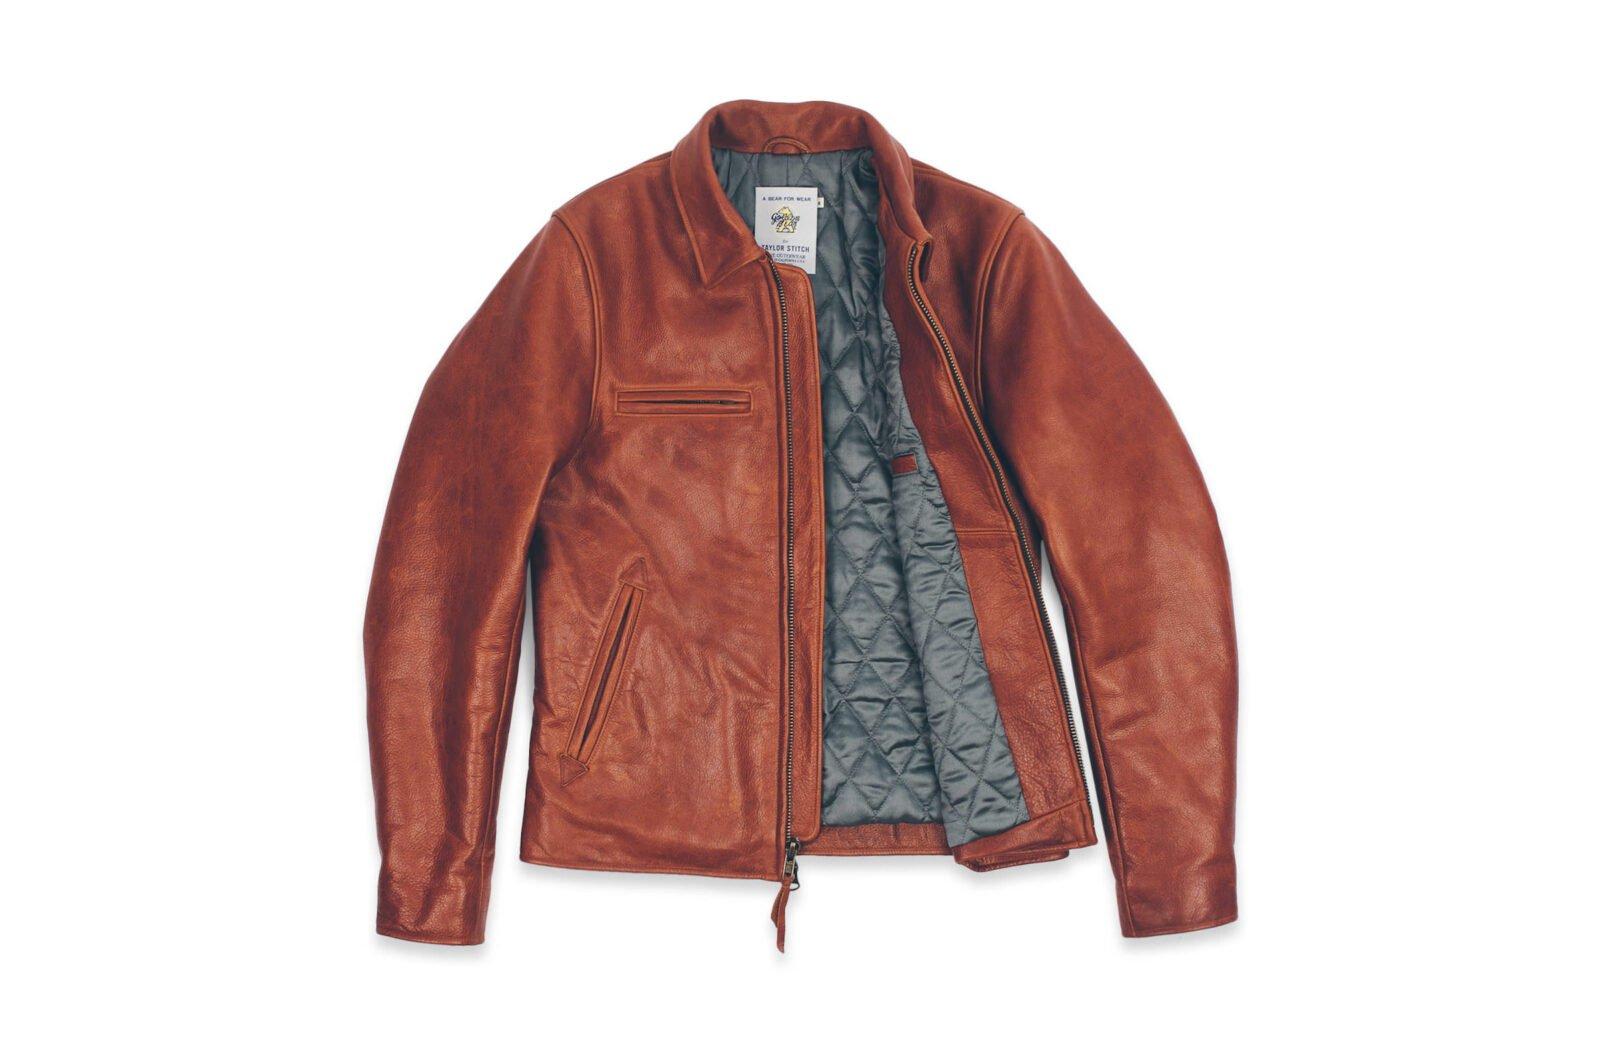 Taylor Stitch Whiskey Steerhide Moto Jacket 1 1600x1061 - Taylor Stitch + Golden Bear Whiskey Moto Jacket